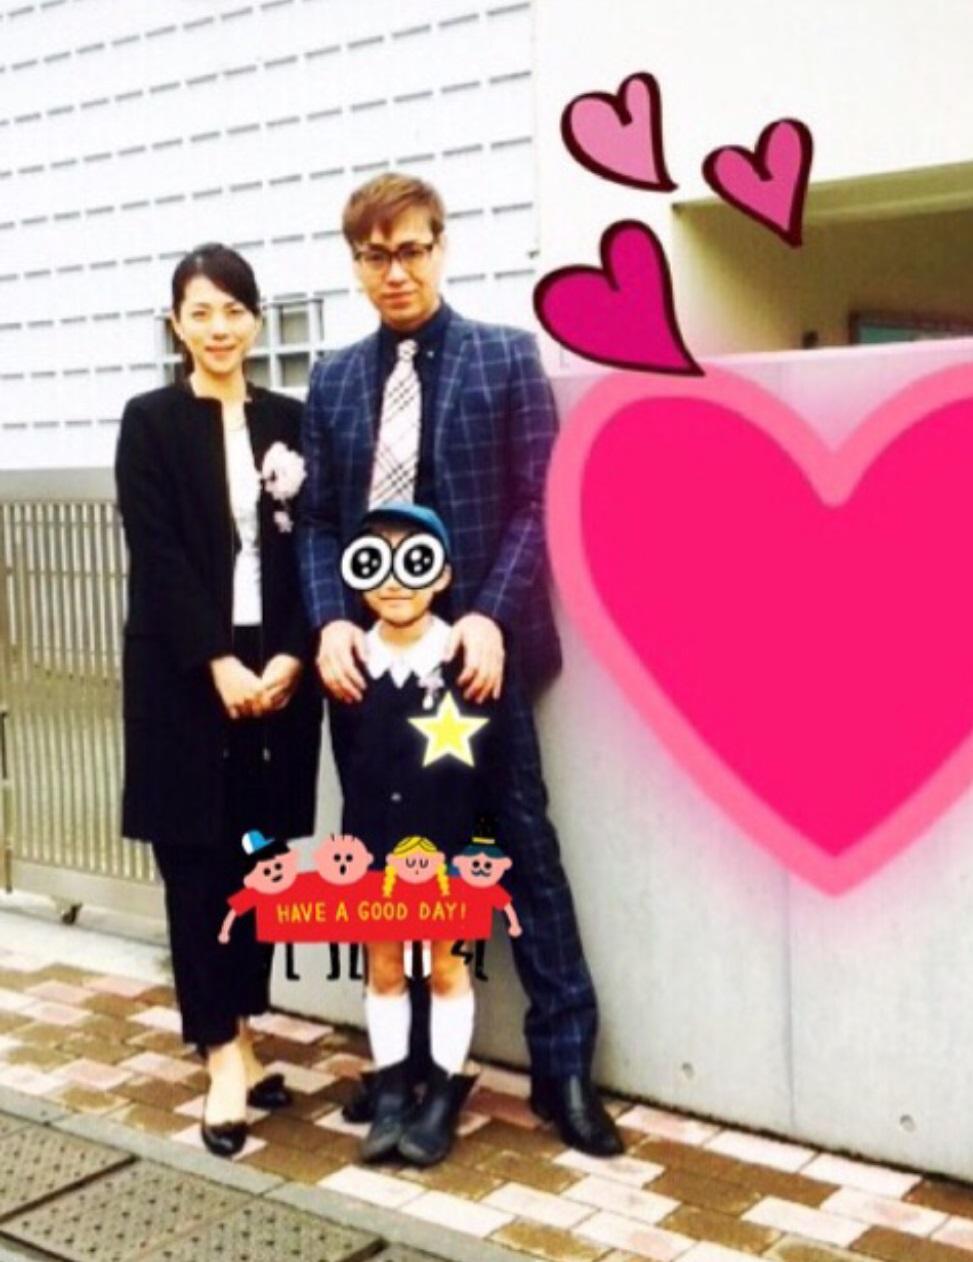 IZAM 妻・吉岡美穂と次男の卒園式ショット公開、ポリシー明かす